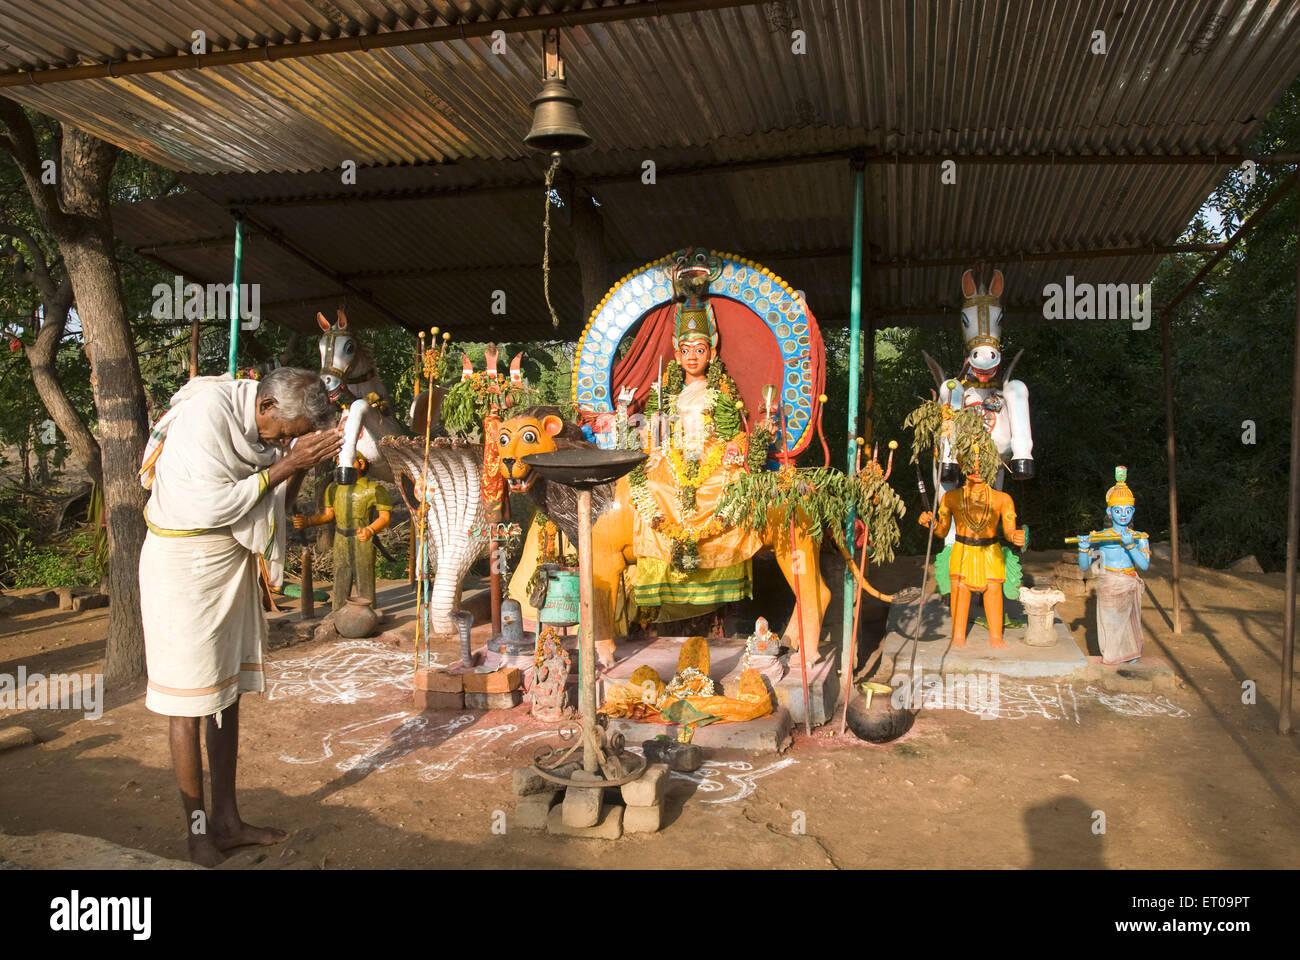 Près de Temple Guardian; Thiruvanamalaï Tamil nadu Inde; Photo Stock